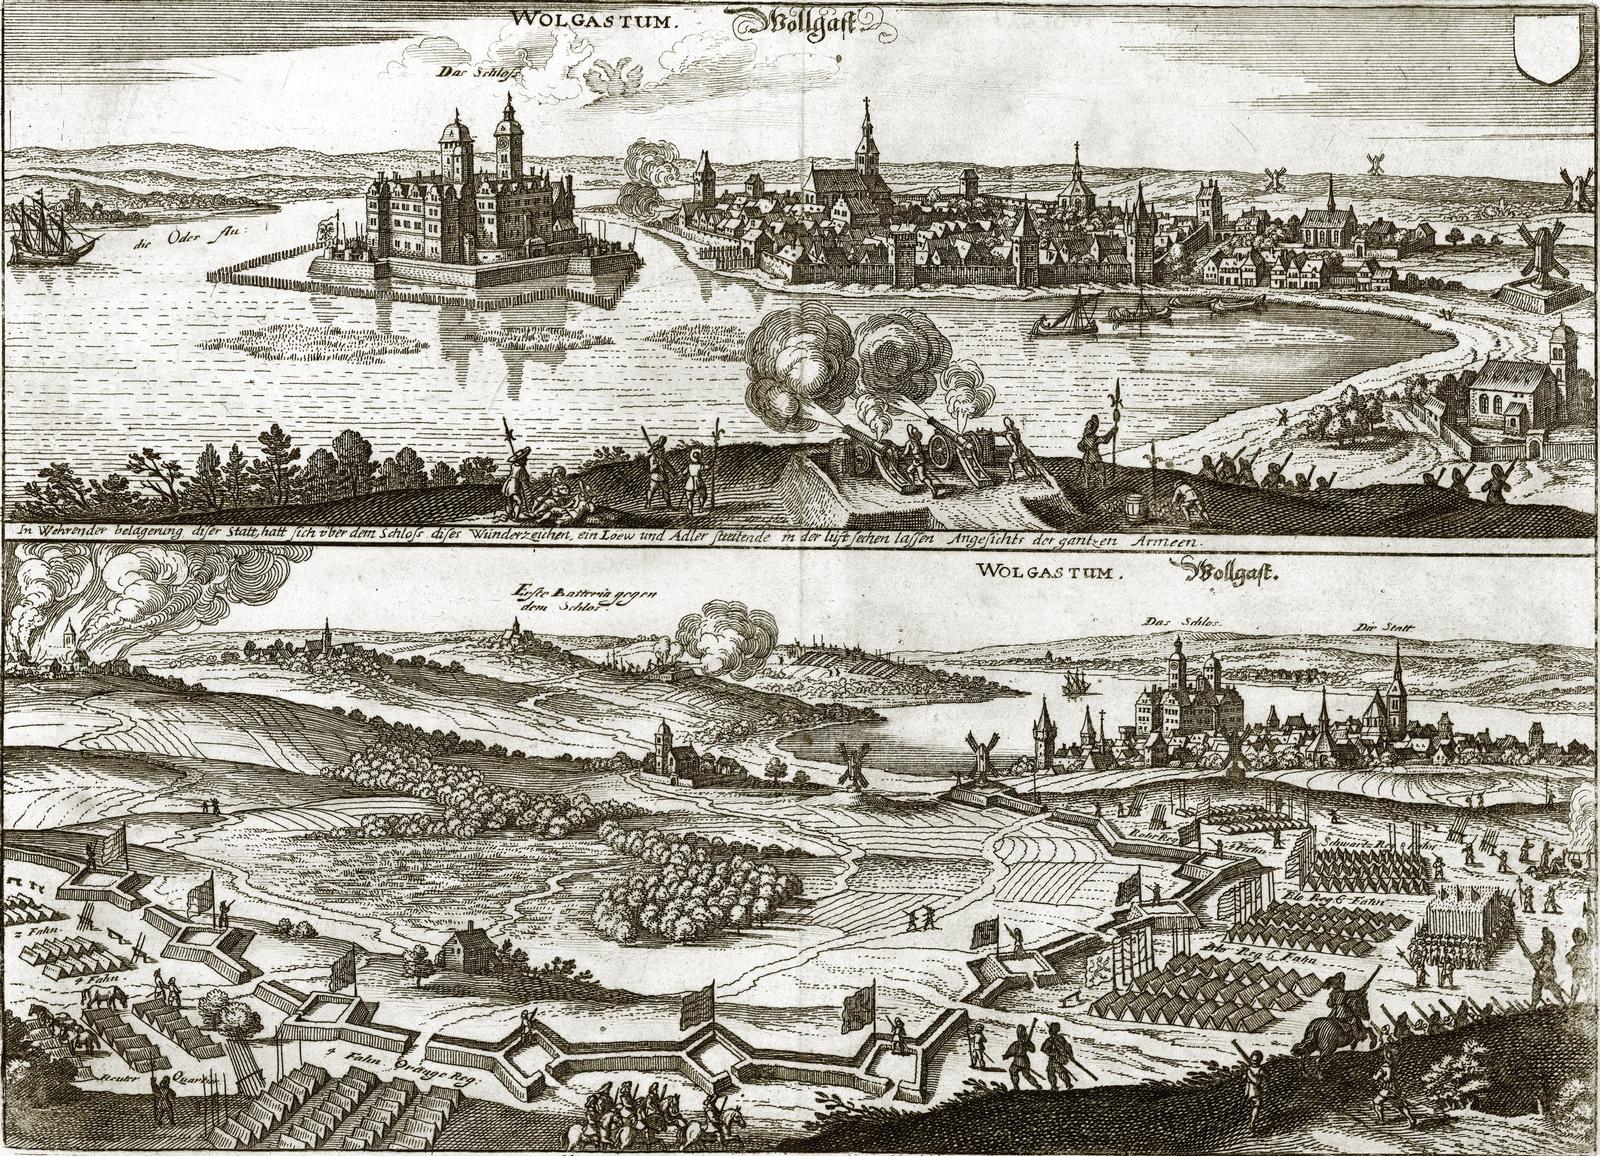 Theatrum_Europaeum_Bd2._Wolgast_1629